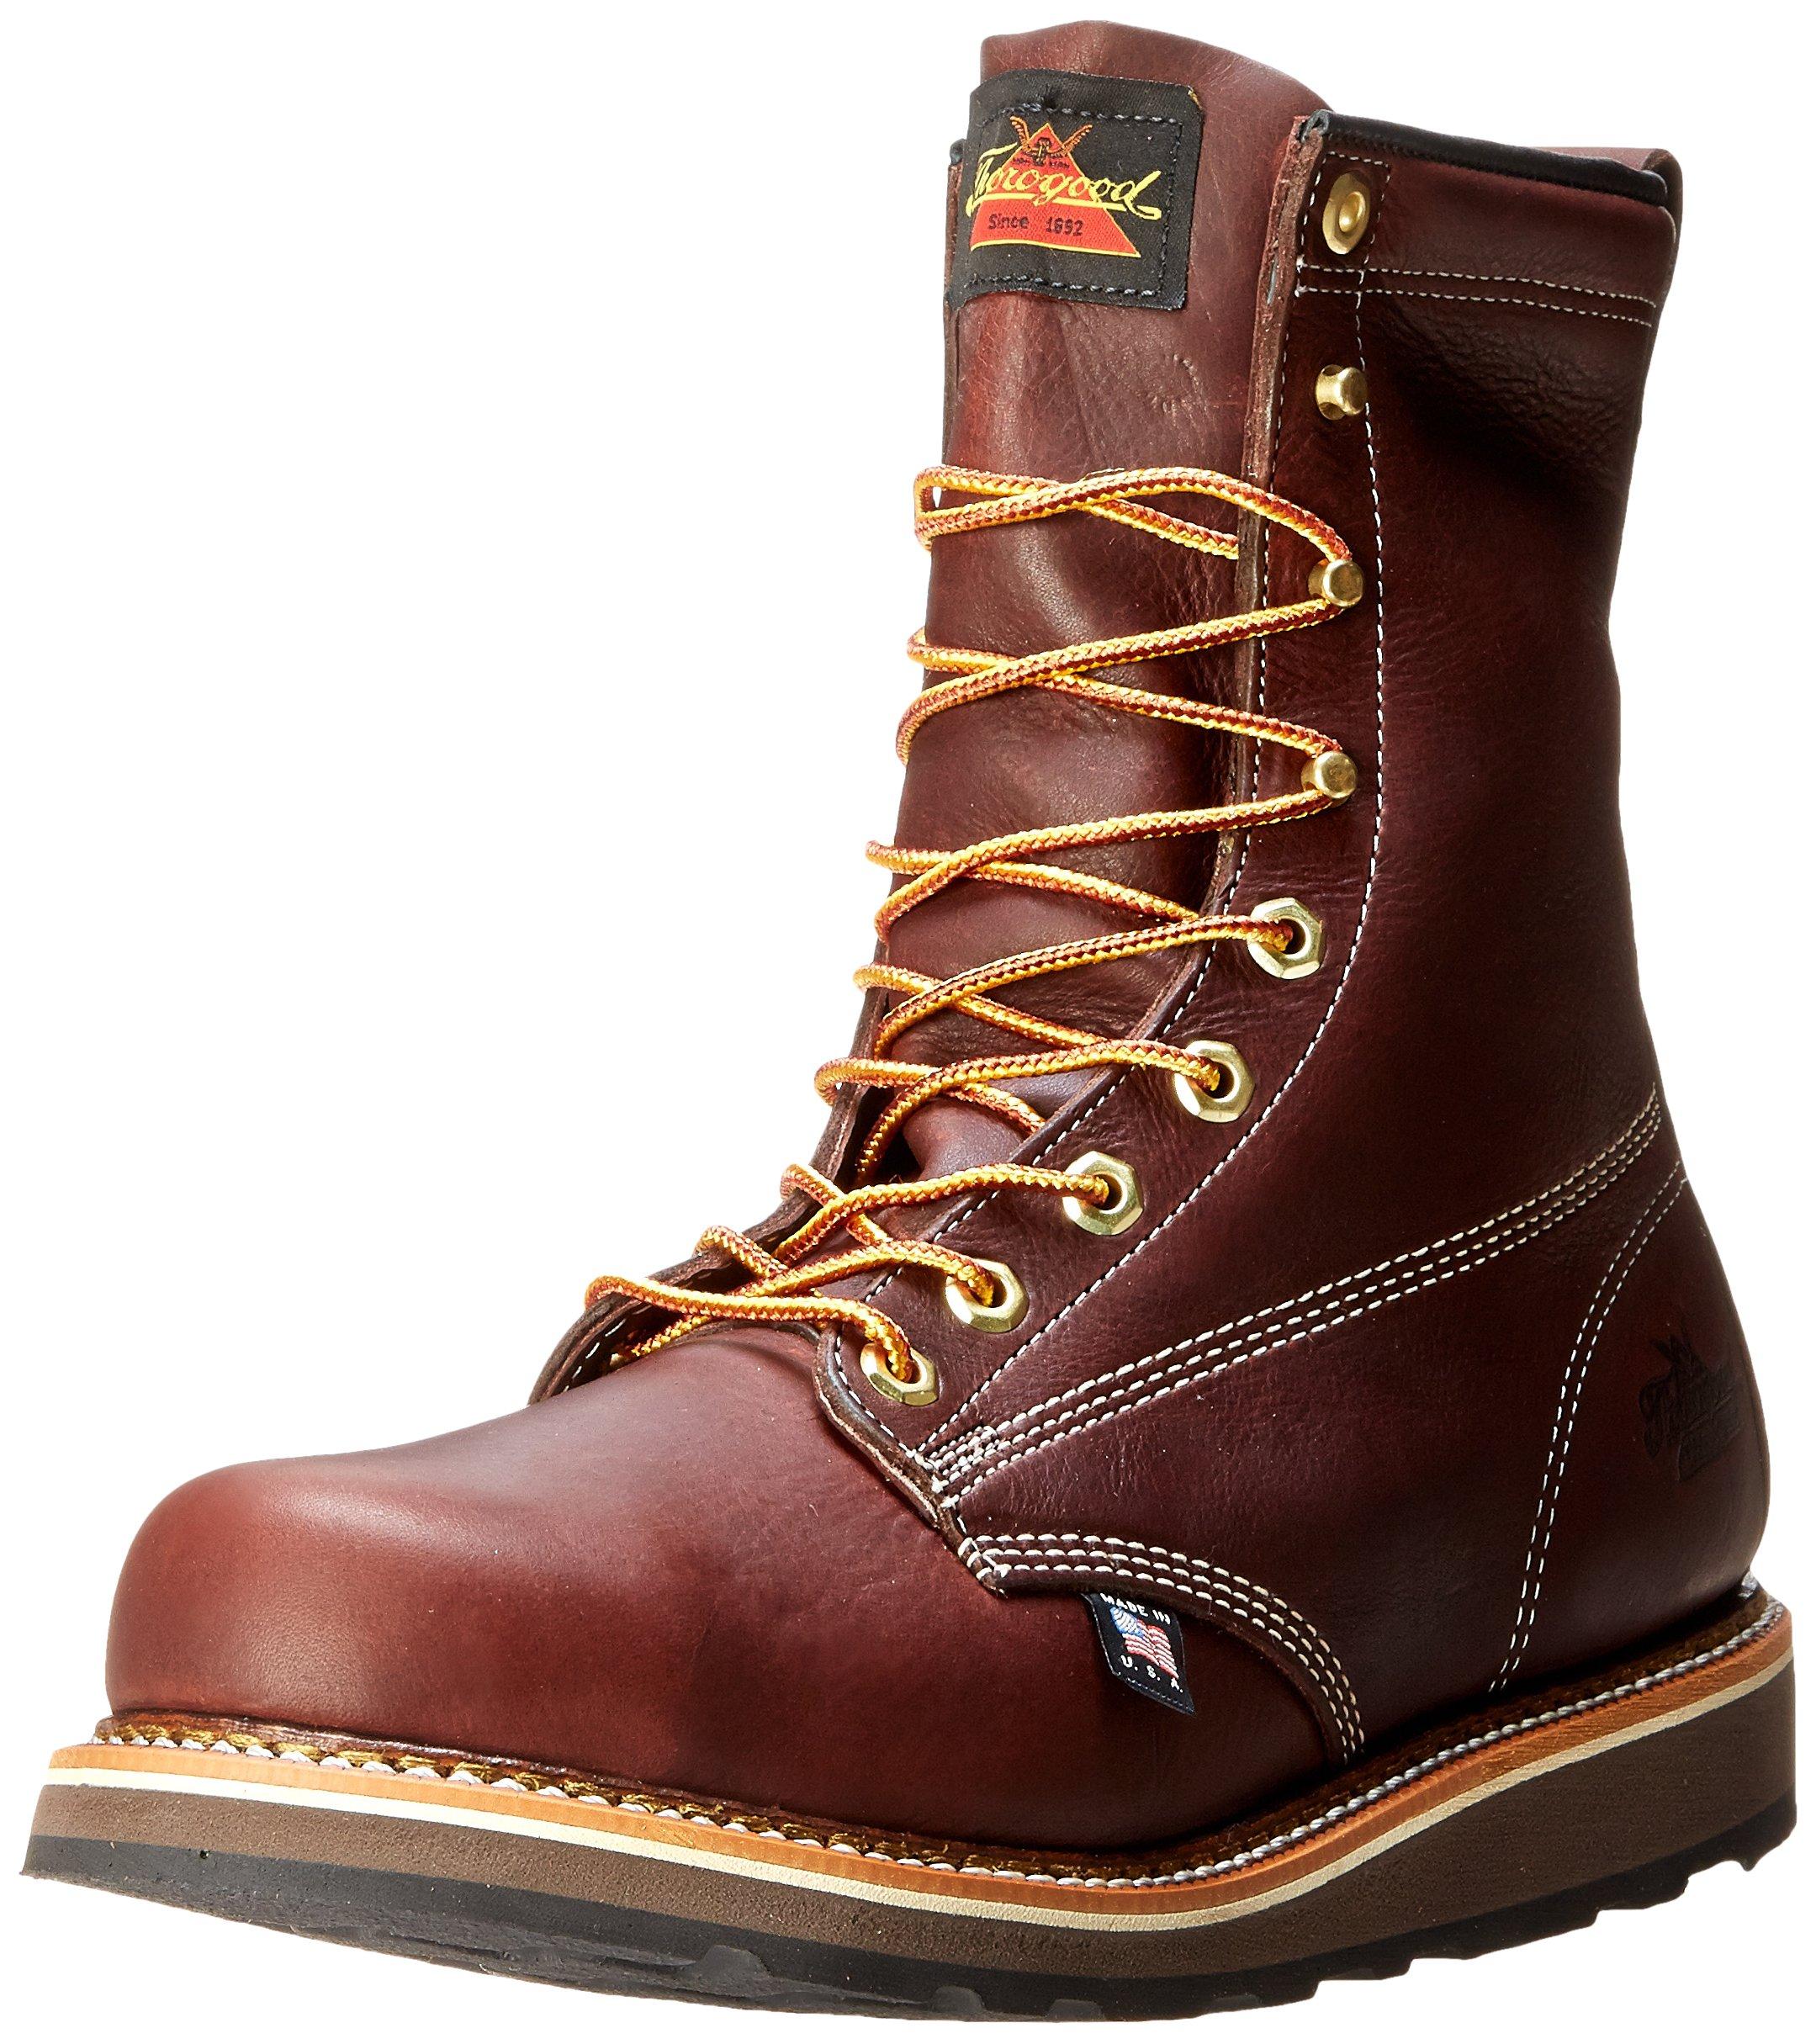 25a579c2f69 Thorogood 804-4518 Men s American Heritage 8